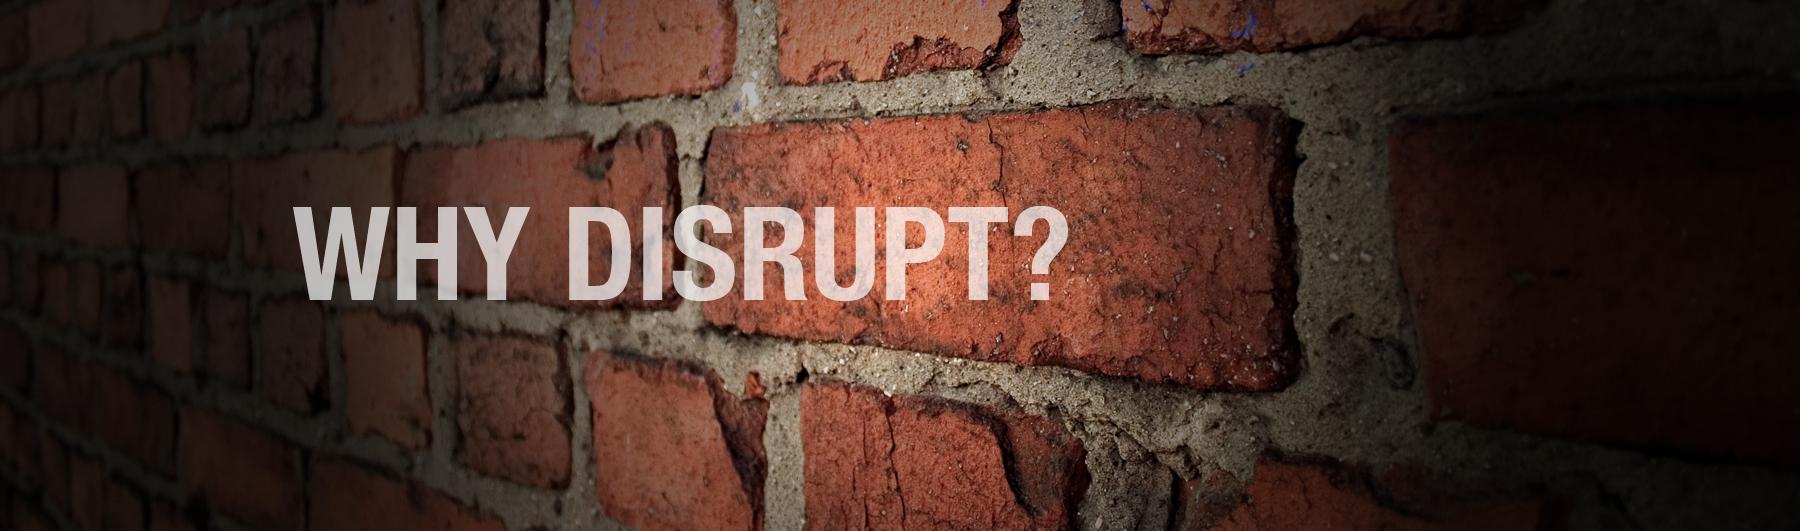 whydisrupt